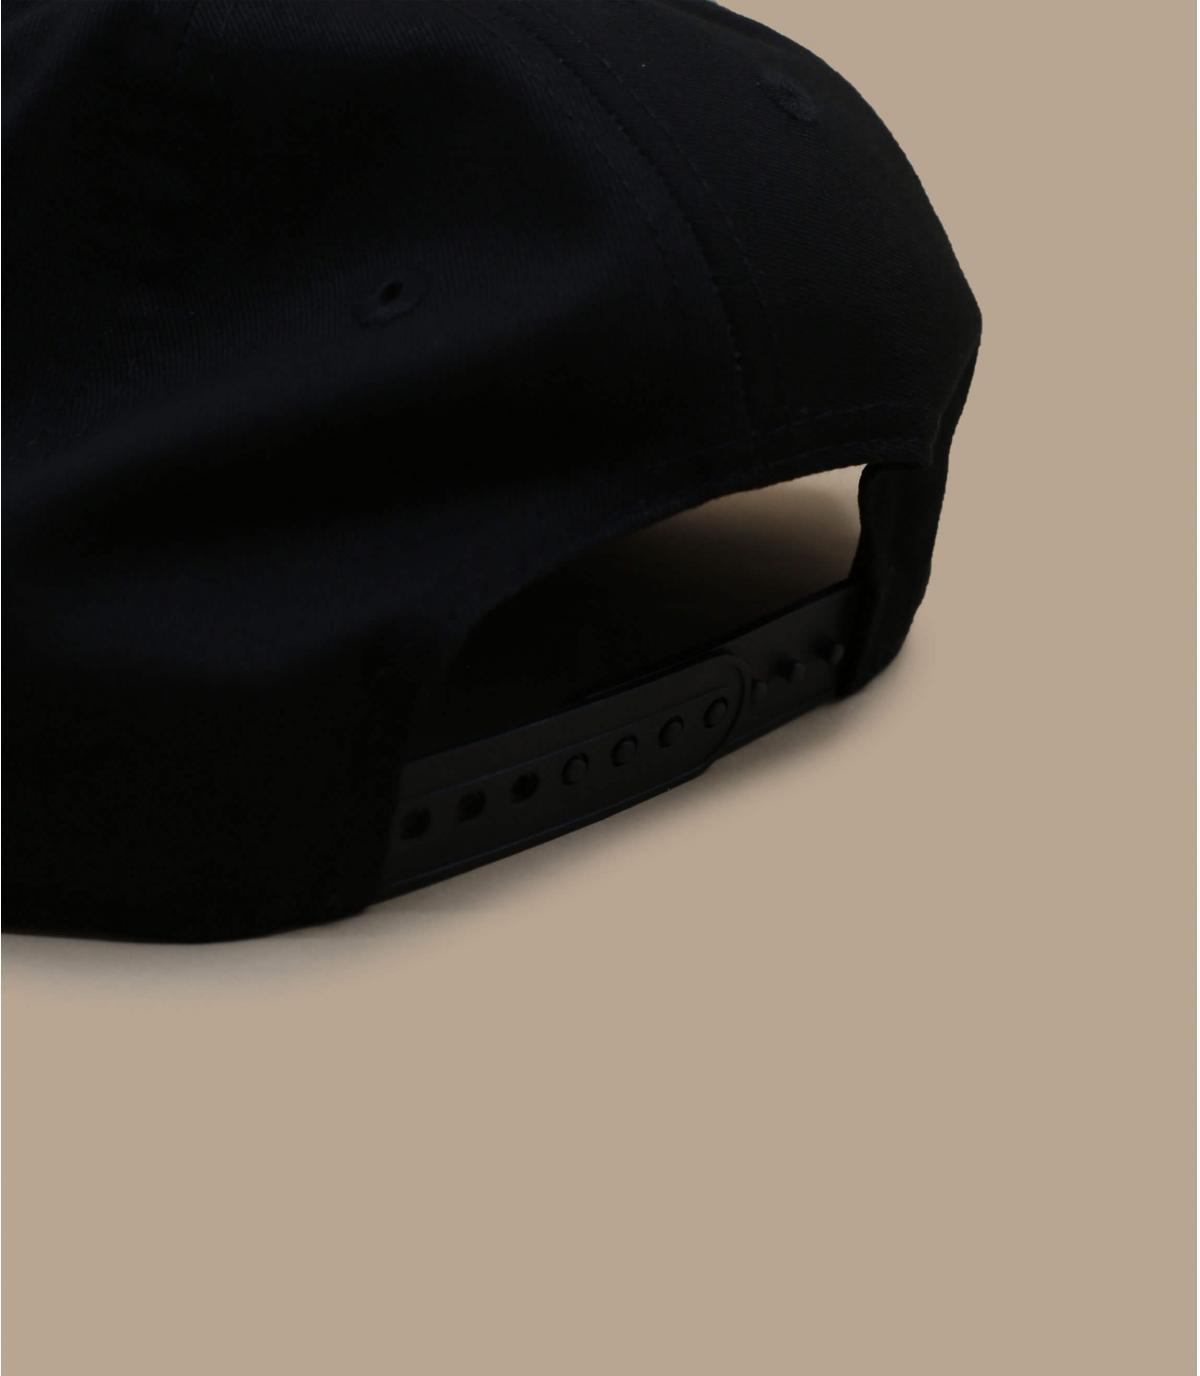 Details Snapback Cap NY MLB black black - Abbildung 4